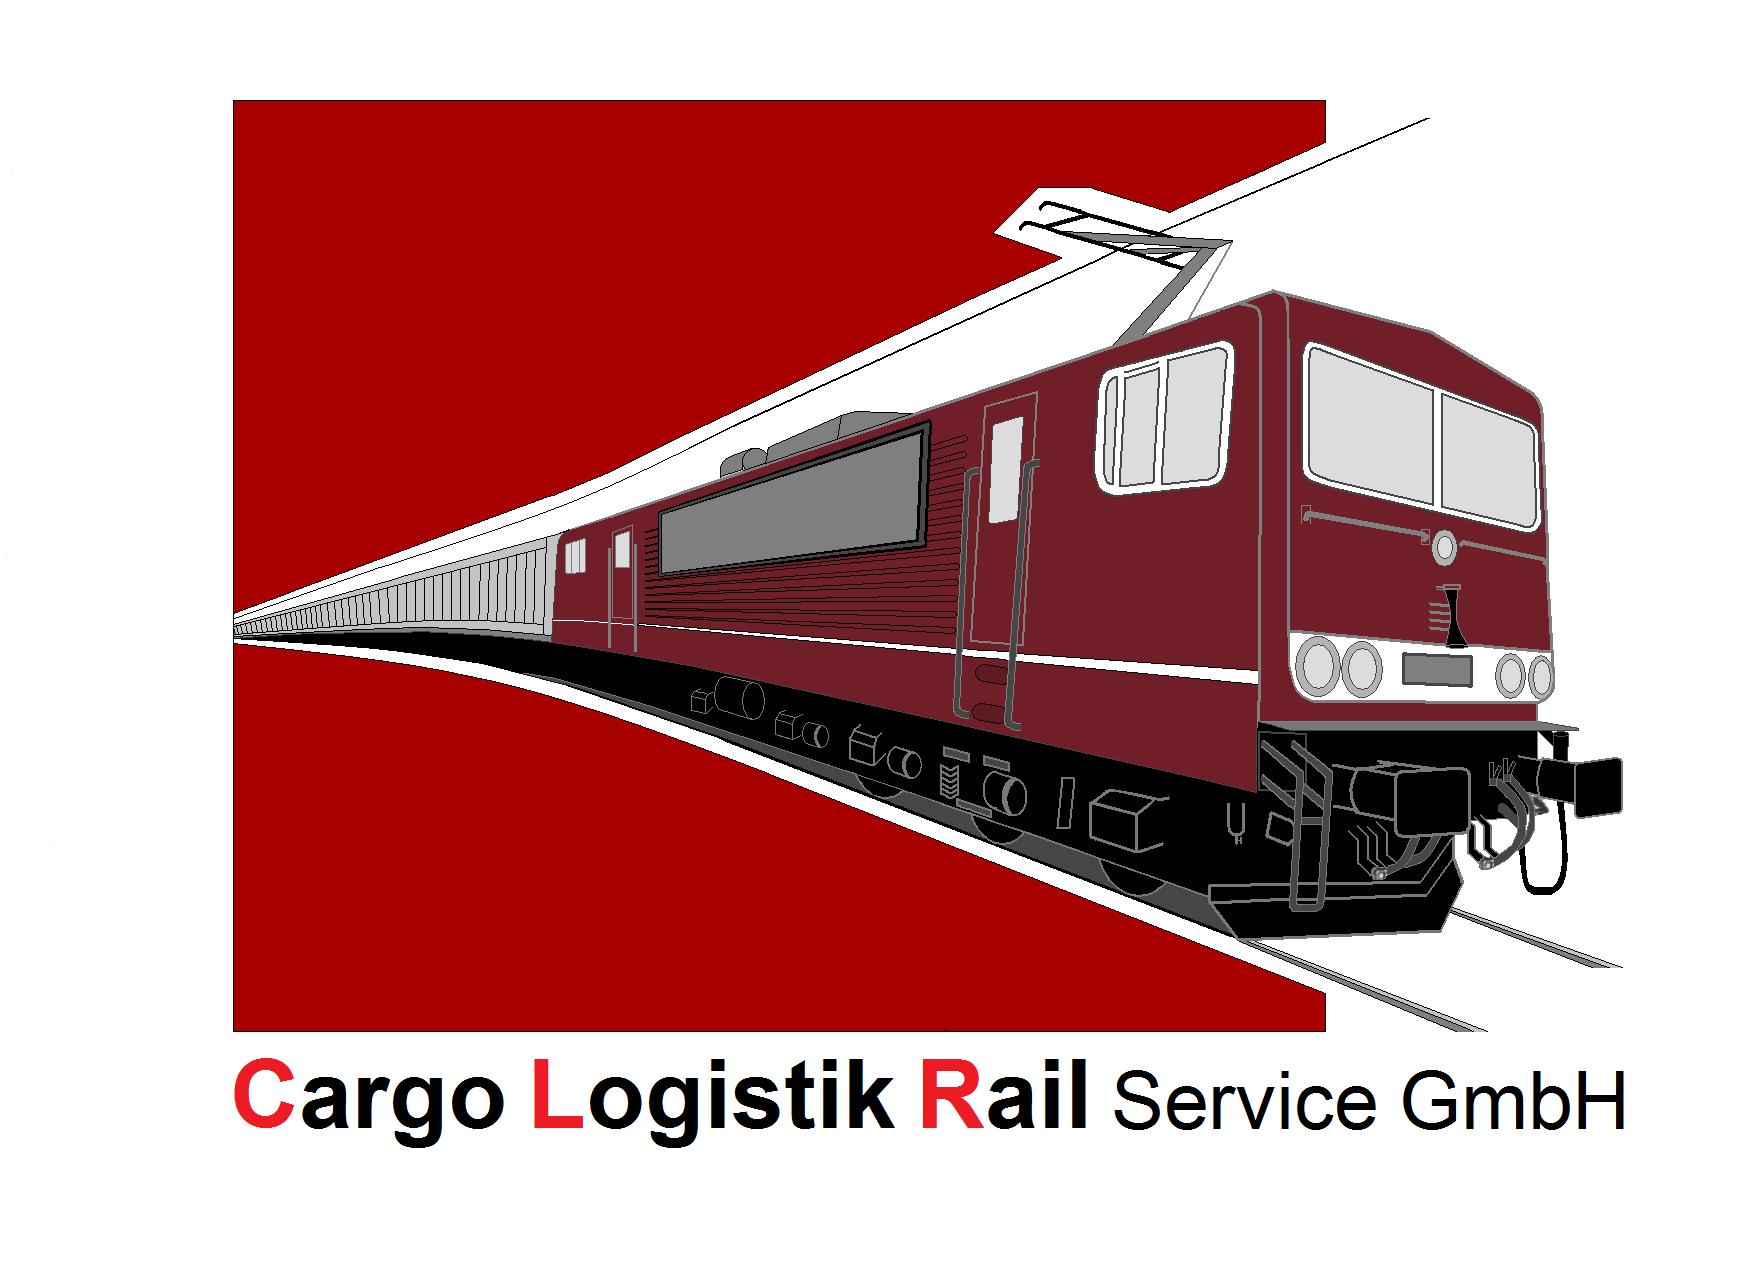 CARGO  LOGISTIK  RAIL  SERVICE  GMBH